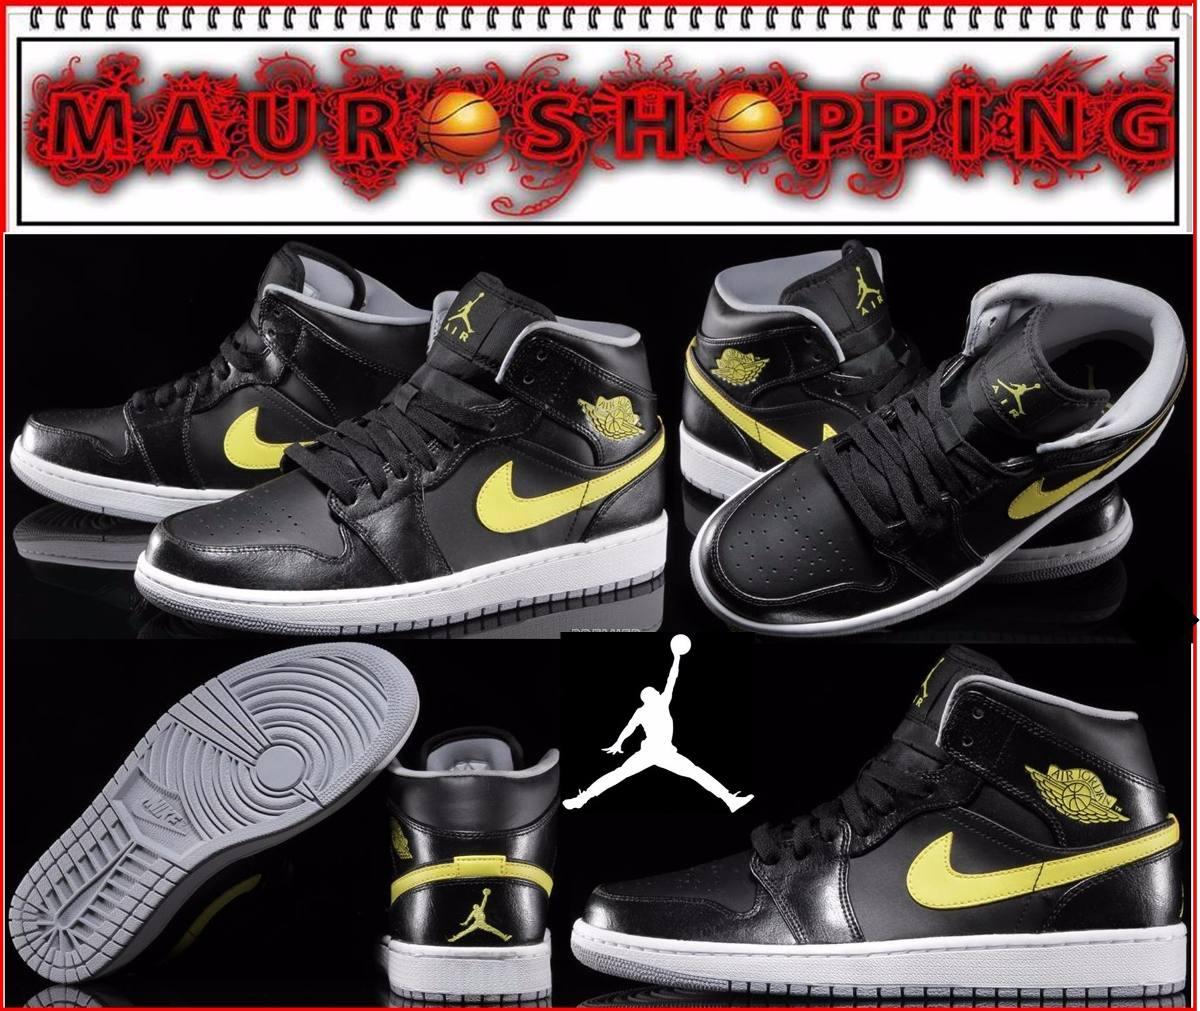 Nike Zapatillas Jordan Basketball Botas Tenis Adidas Nba VqUjMpGLSz